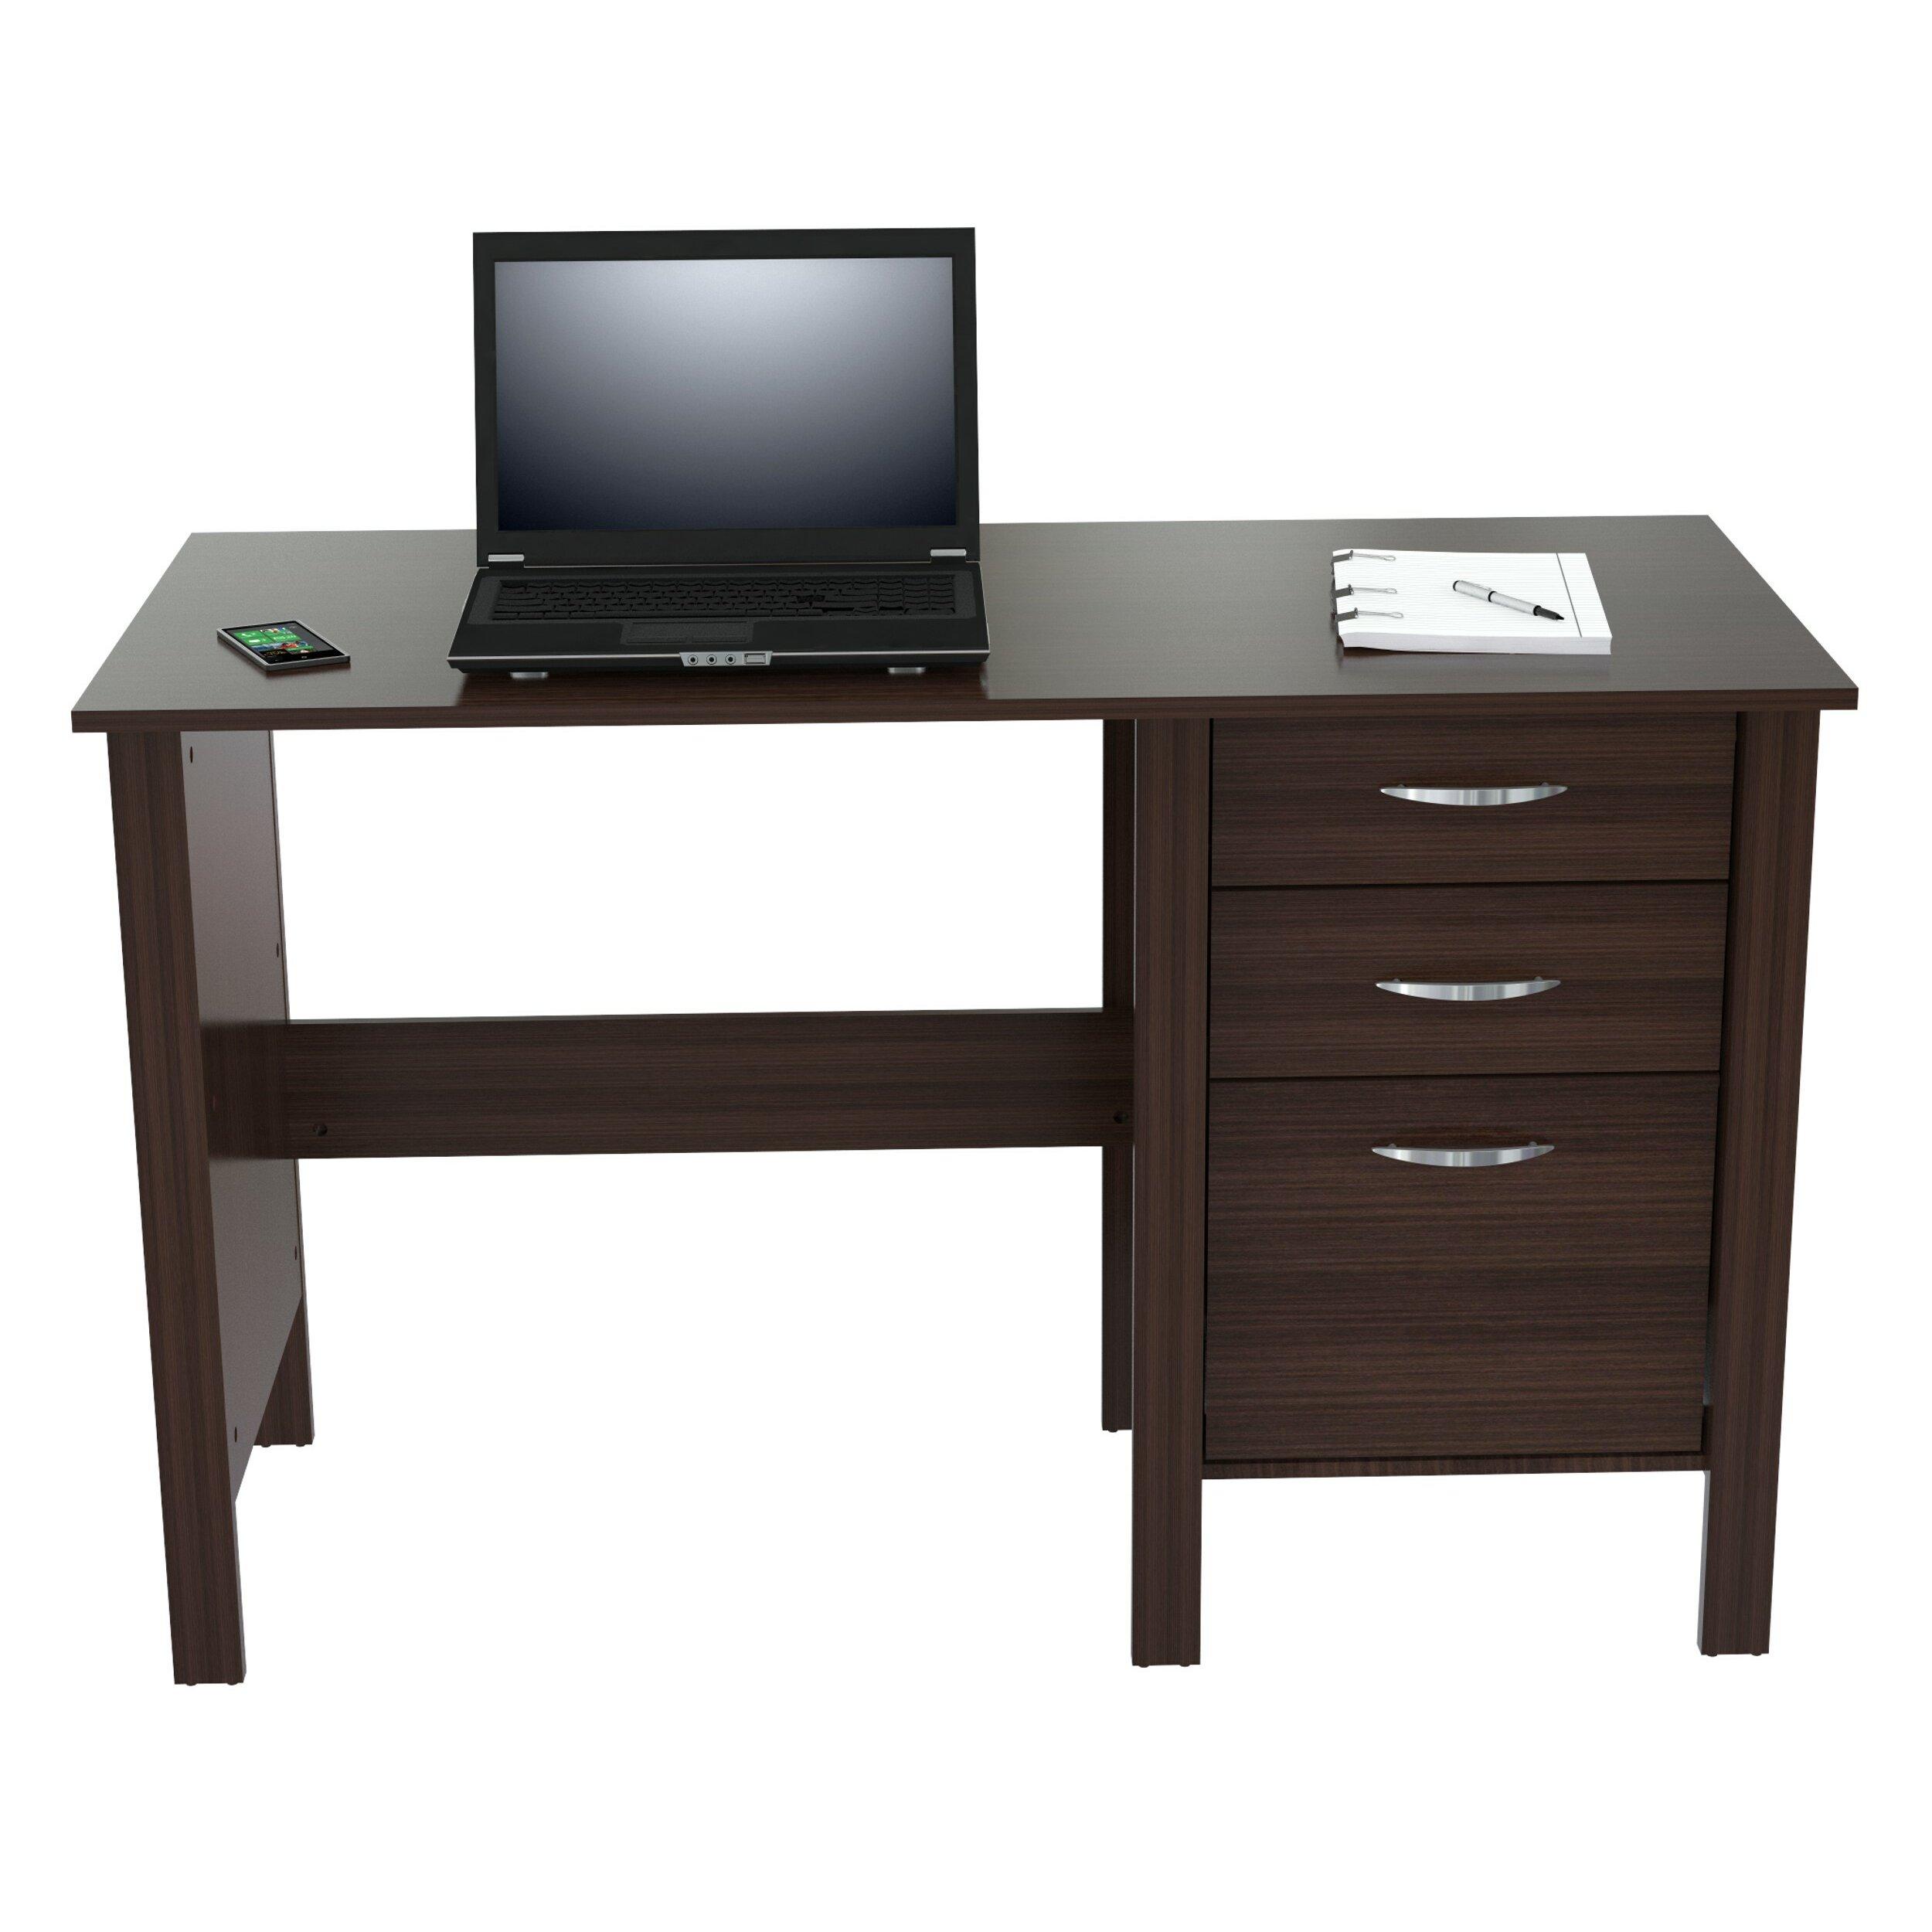 computer desk with 3 drawers wayfair. Black Bedroom Furniture Sets. Home Design Ideas